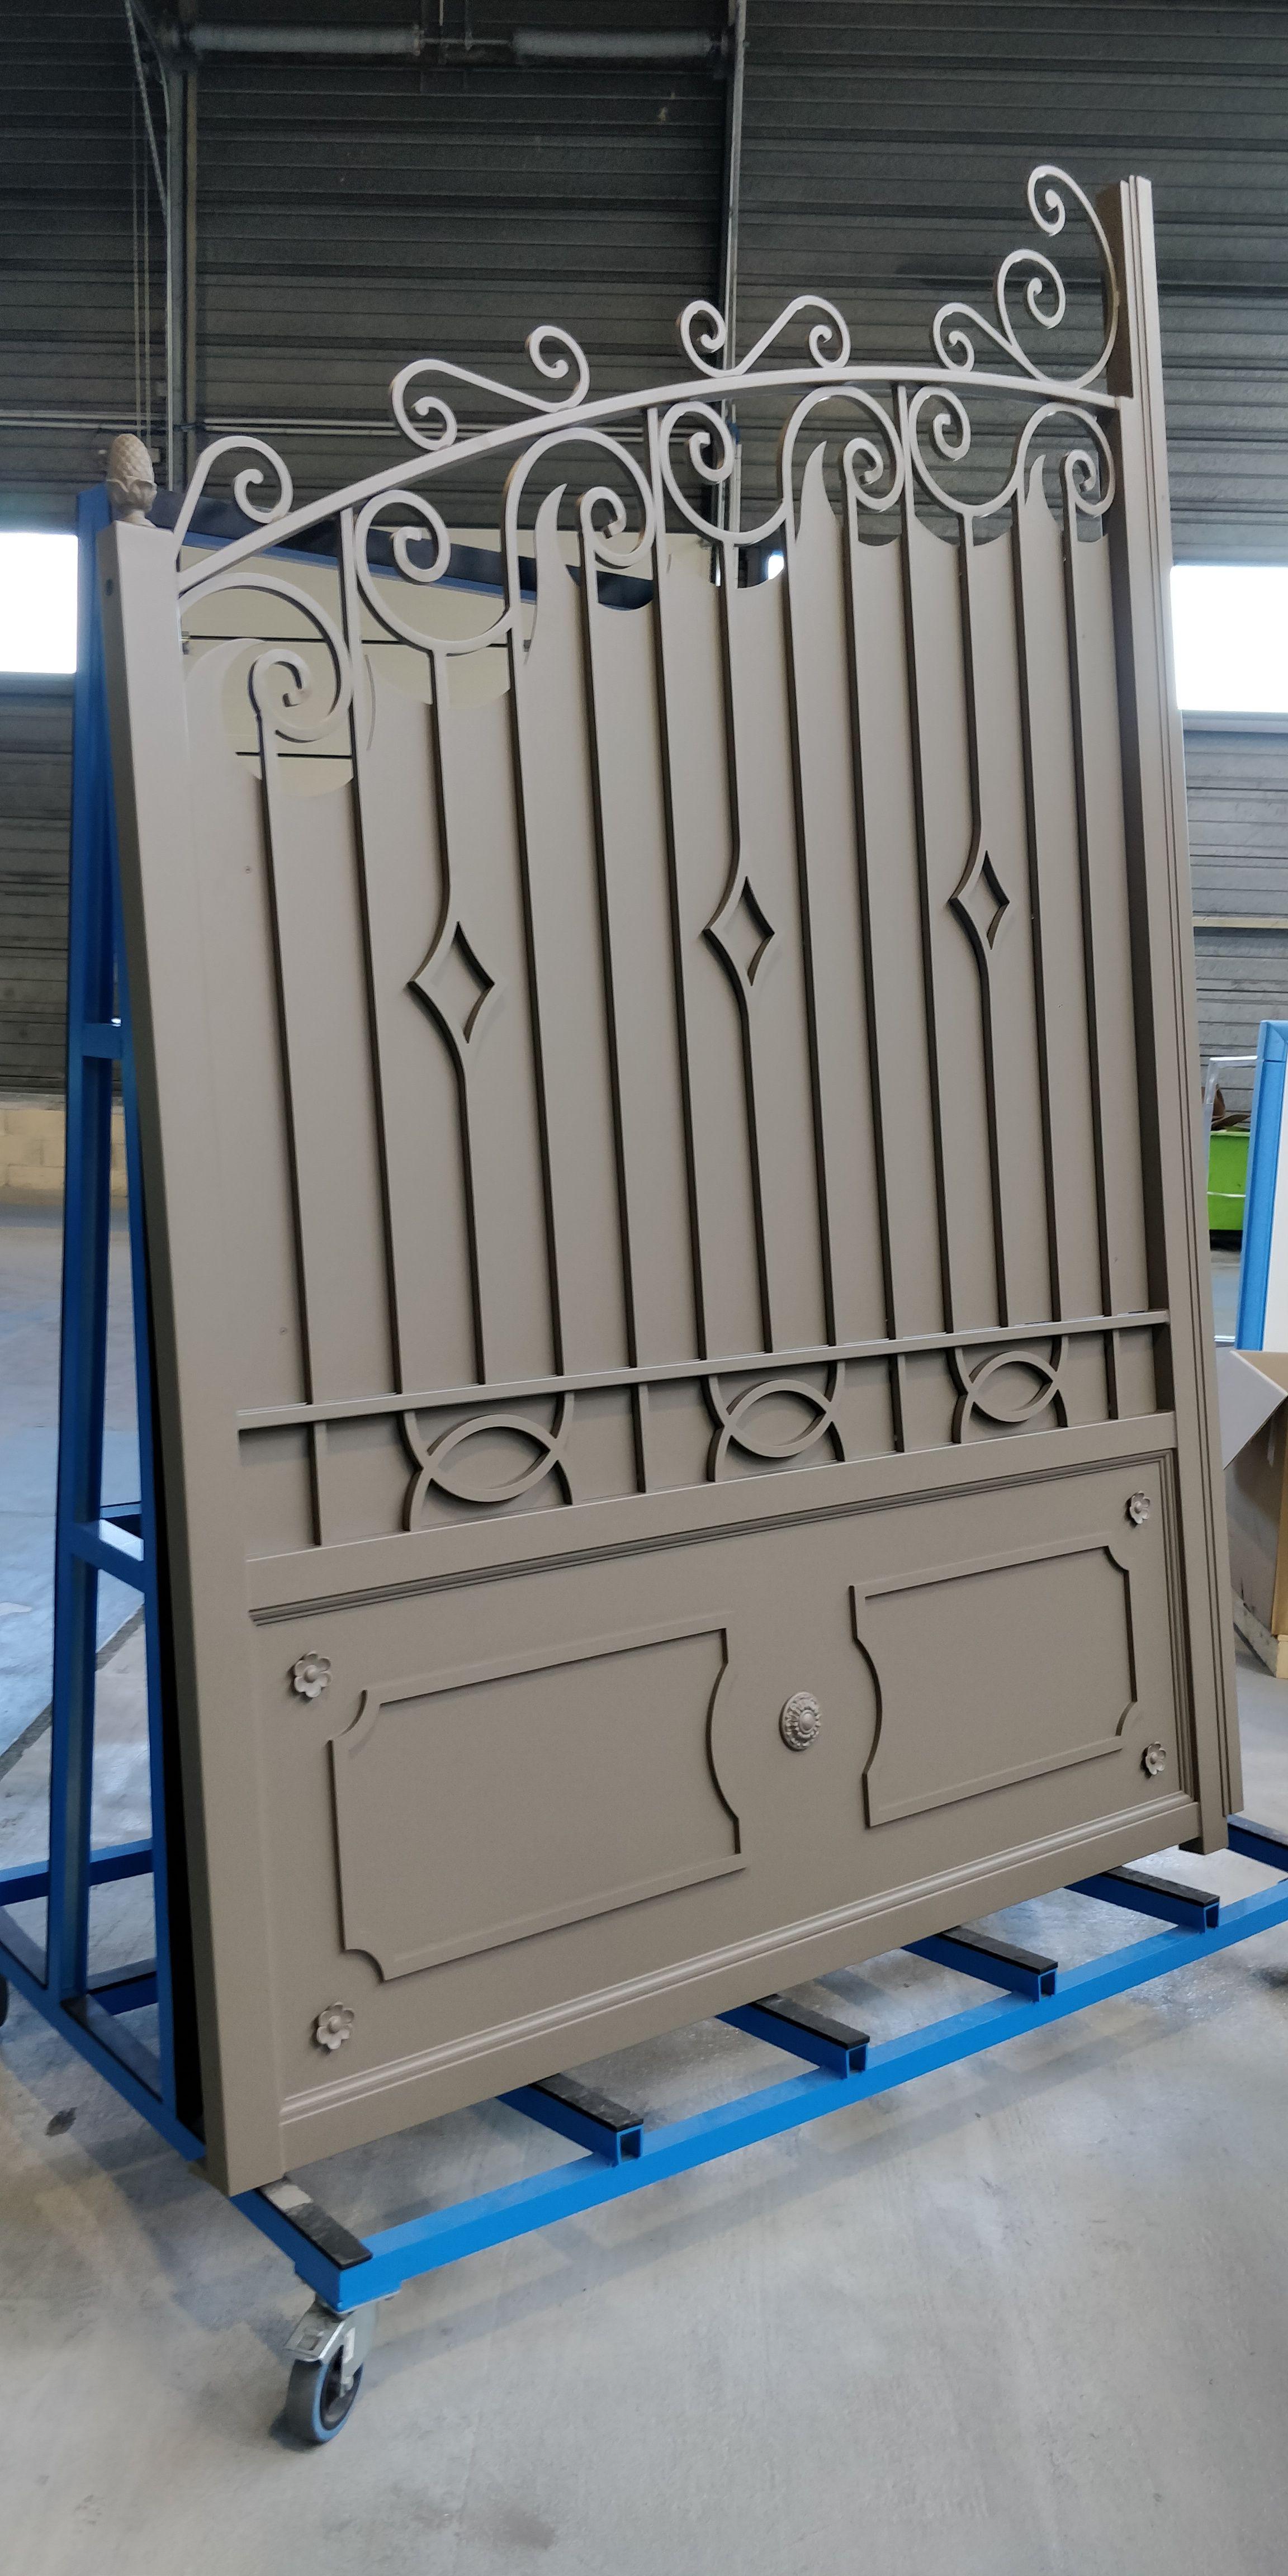 Portail Alu Ouvrage Sur Mesure Portail Portillon Gate Gardecorps Claustra Marquise Aluminium Surmesure Usine Dijon En 2020 Portail Alu Portillon